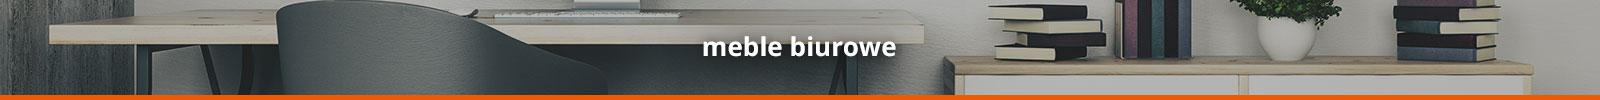 m kt 7874 1600x100 meble biurowe